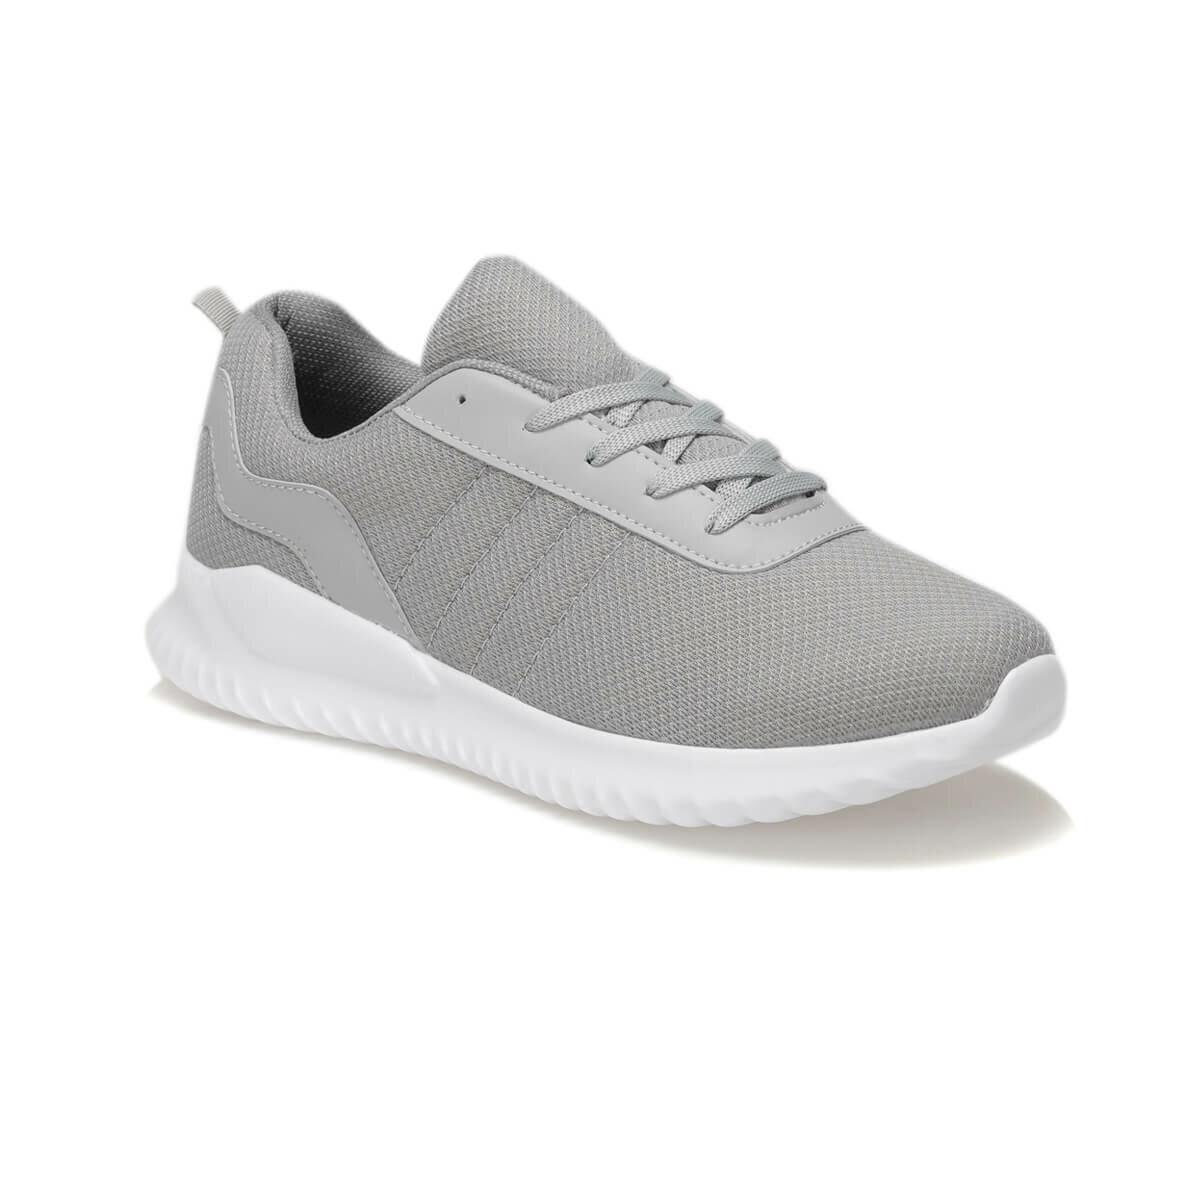 FLO PERRY Light Gray Men 'S Sneaker Shoes Torex